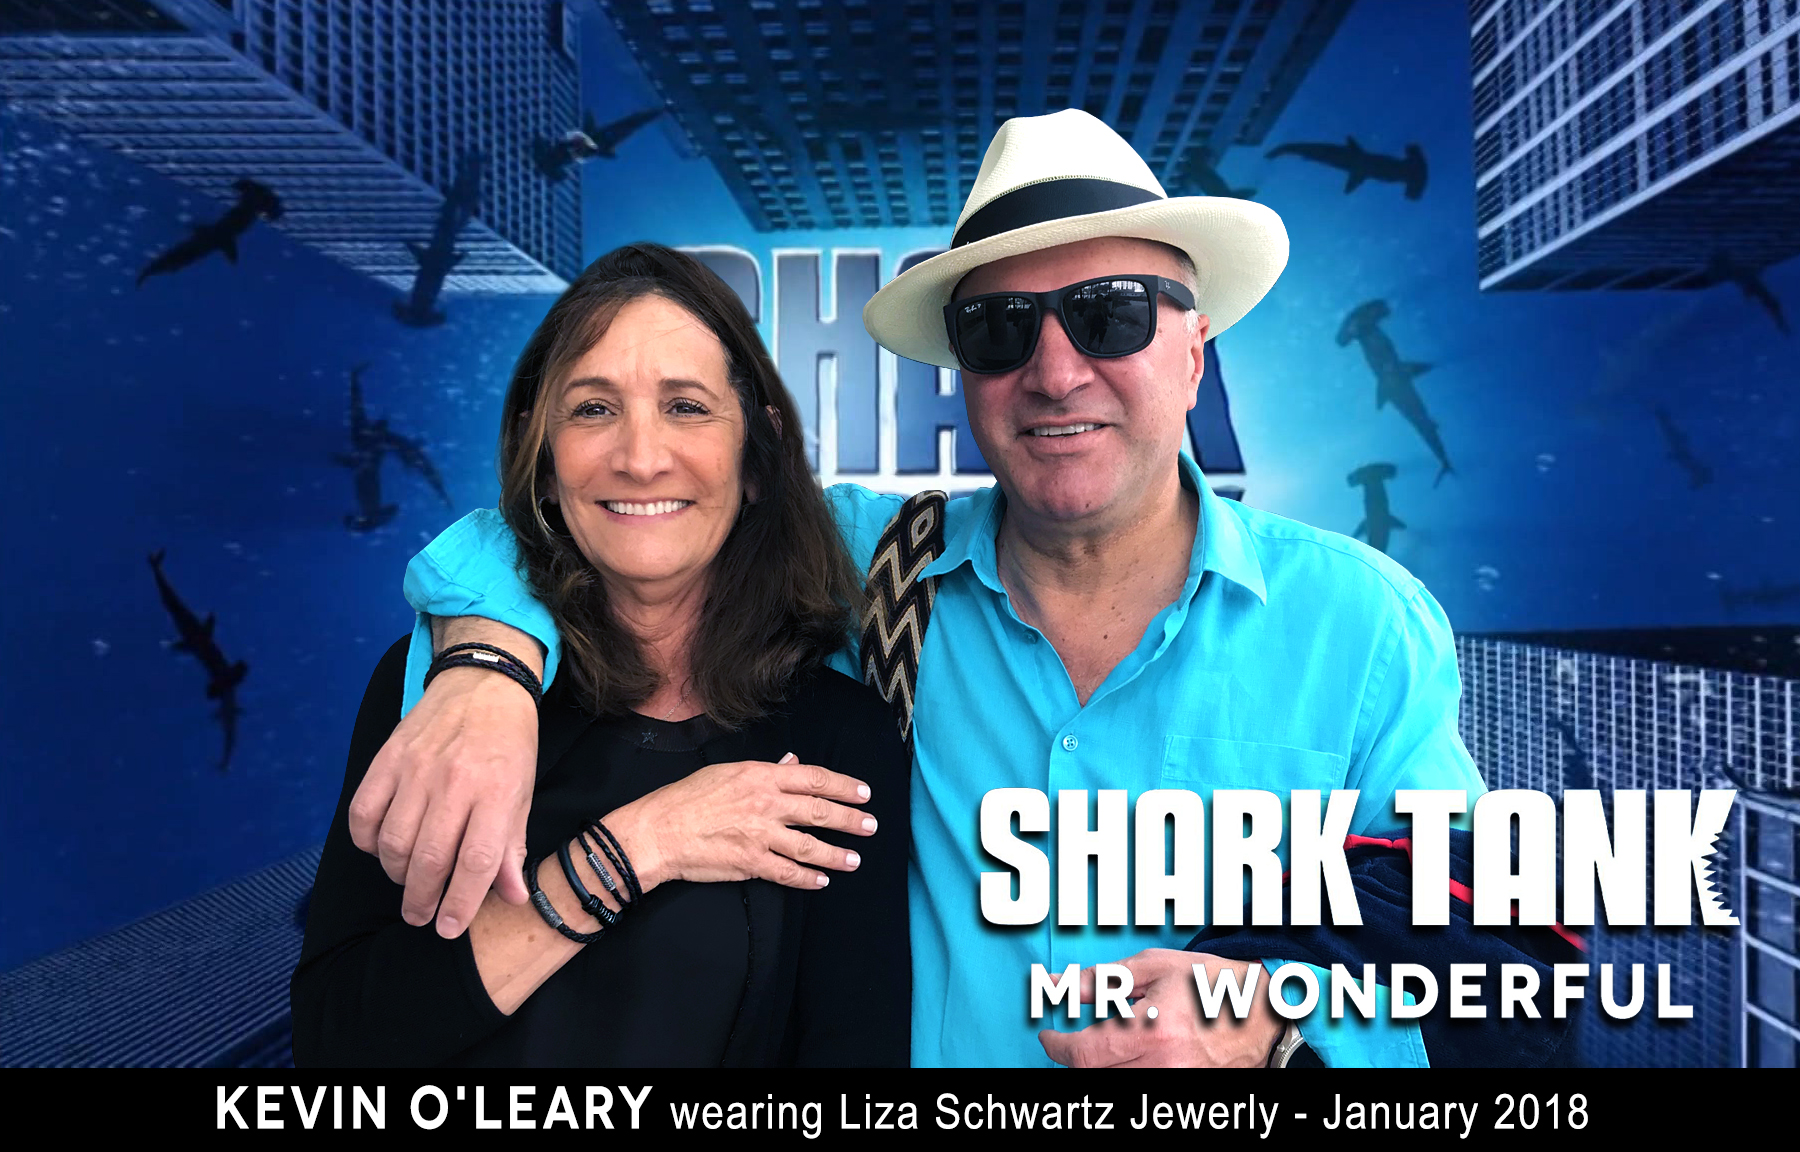 lizapress-mr-wonderful-shark-tank-celebrity-page.jpg